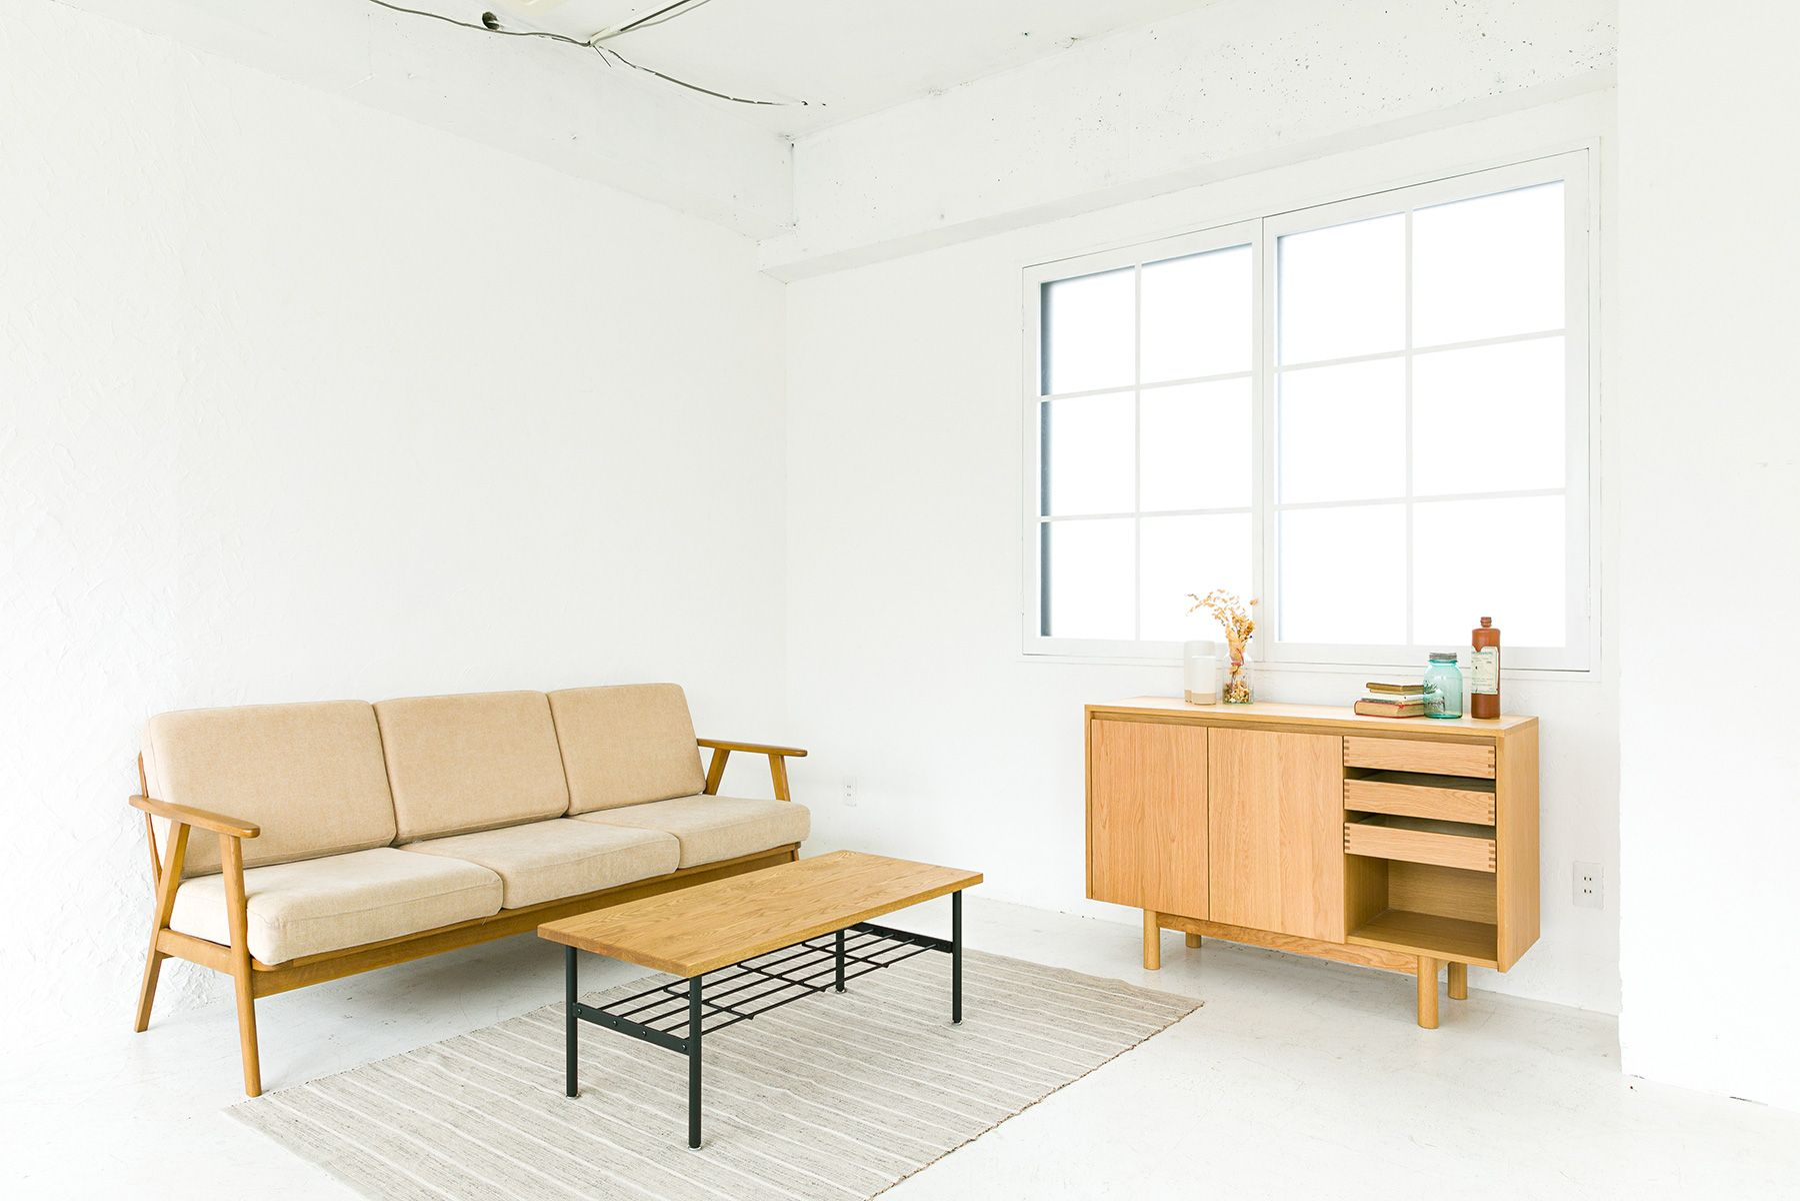 studio Flocke 渋谷神泉 (スタジオ フロック)